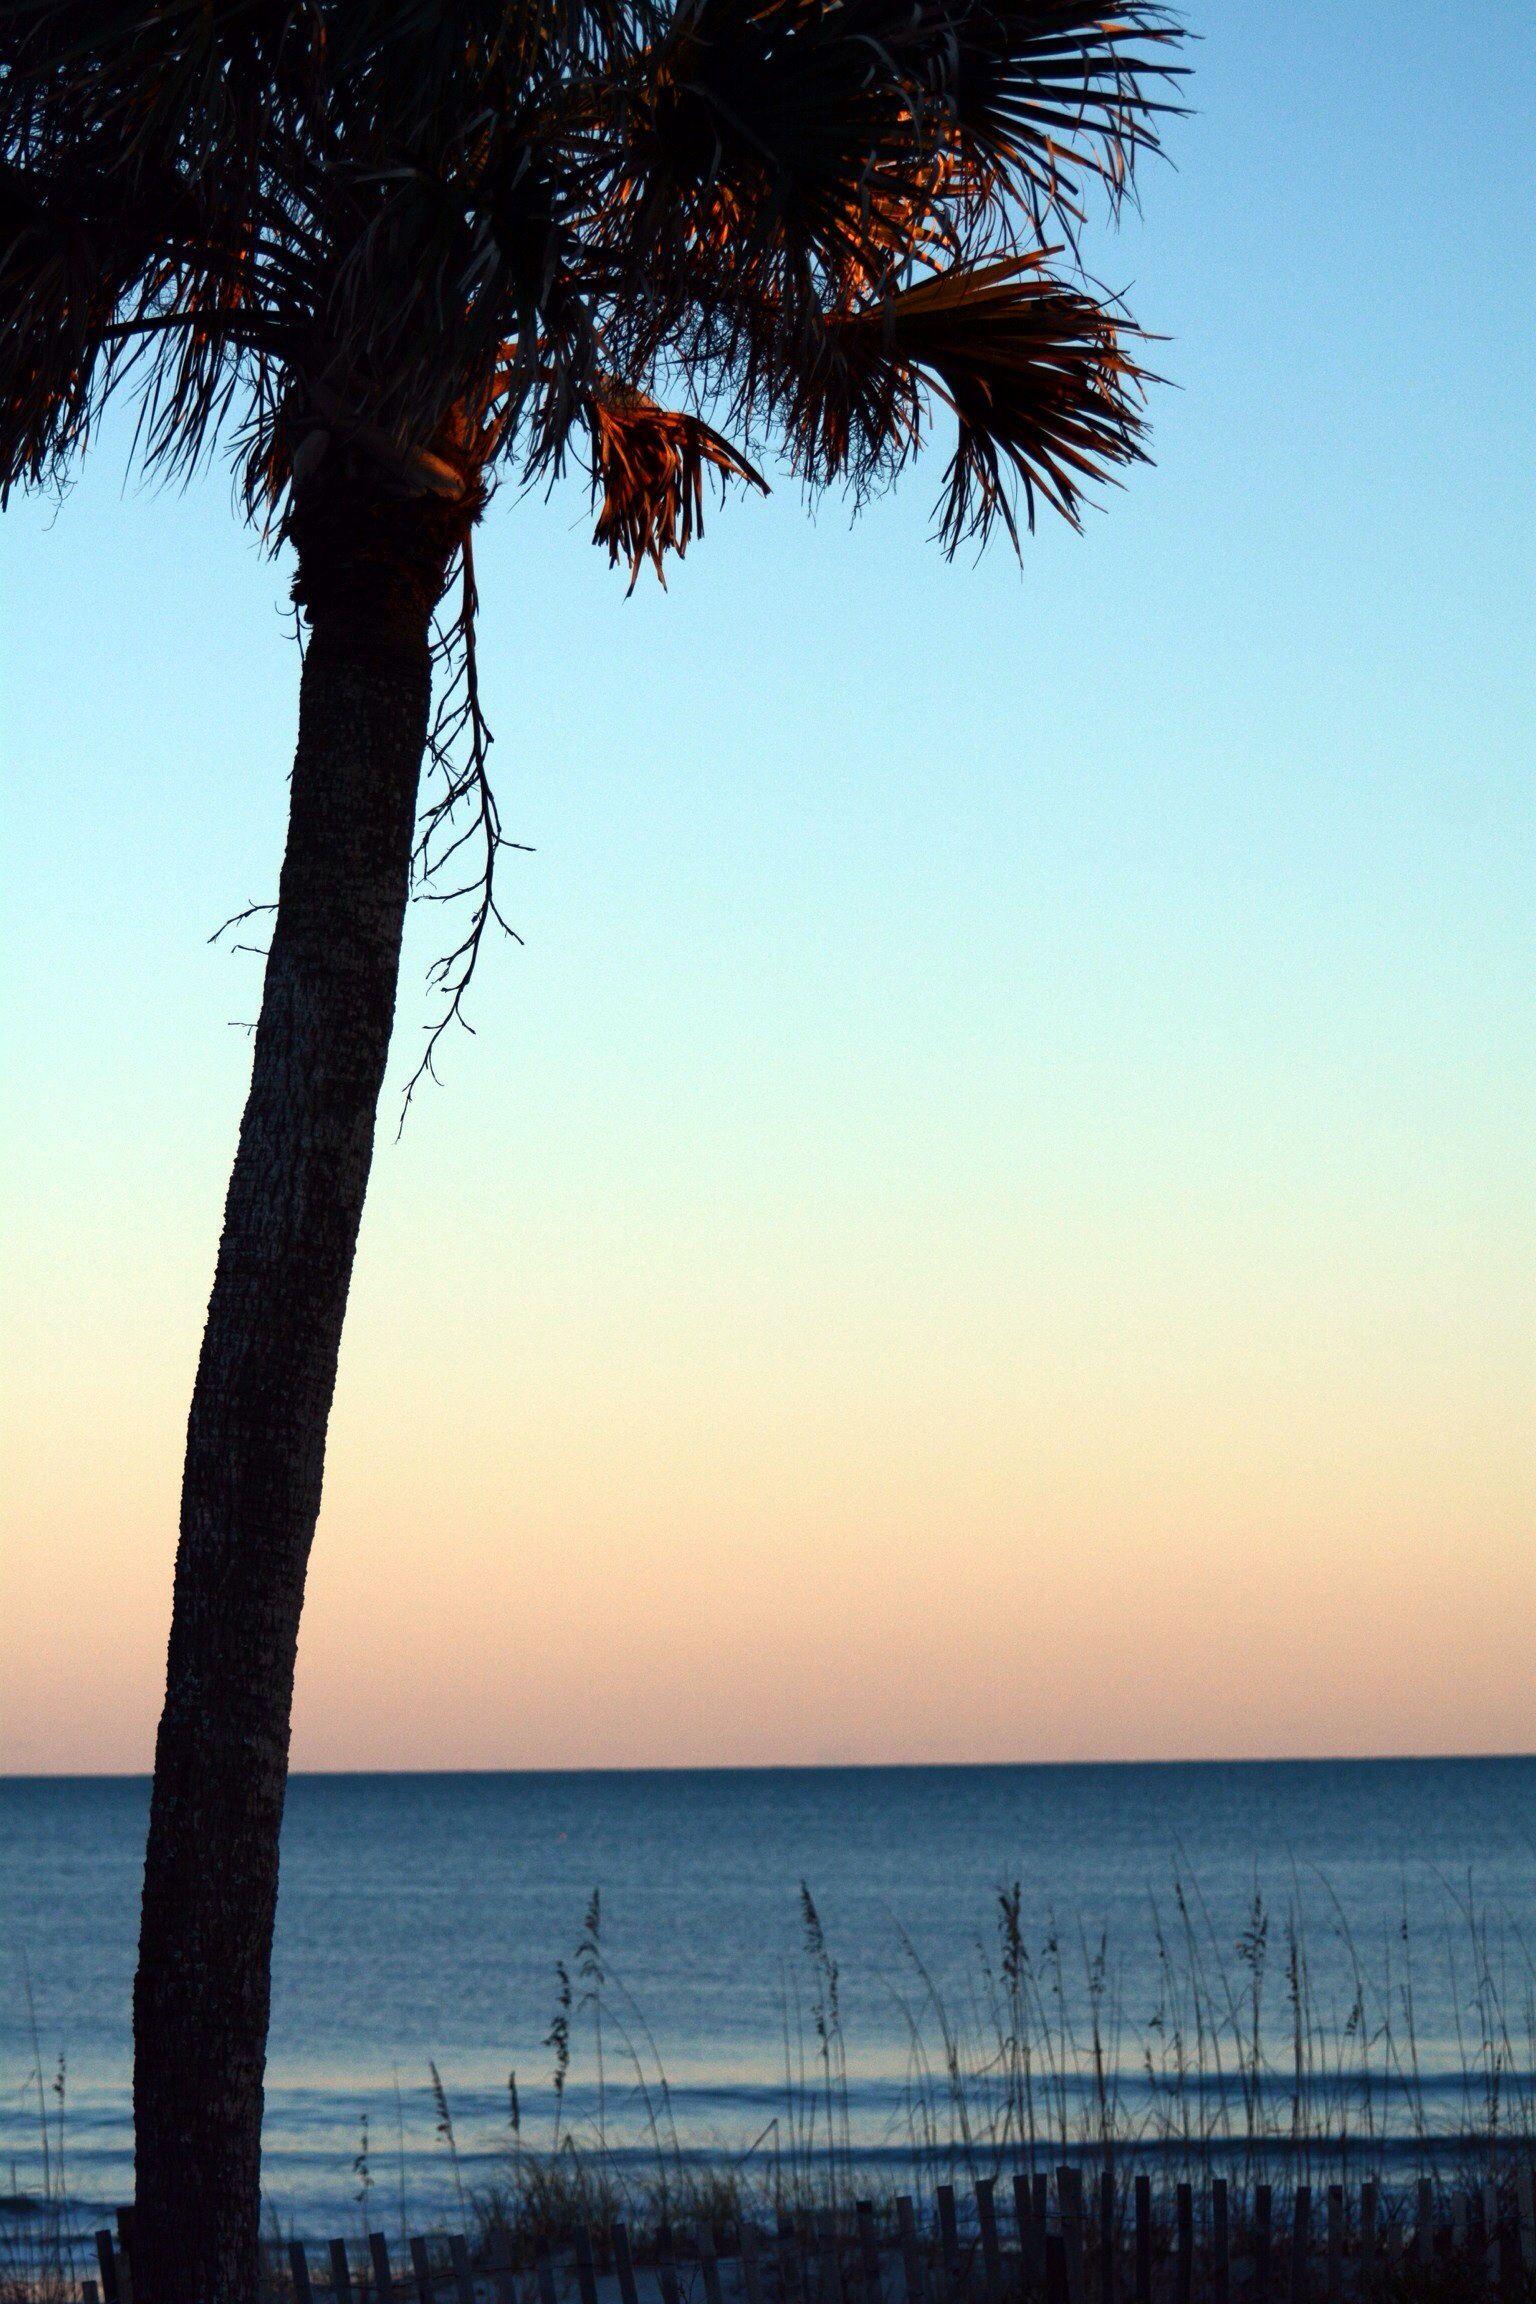 Myrtle Beach Ocean Palm Tree Photography